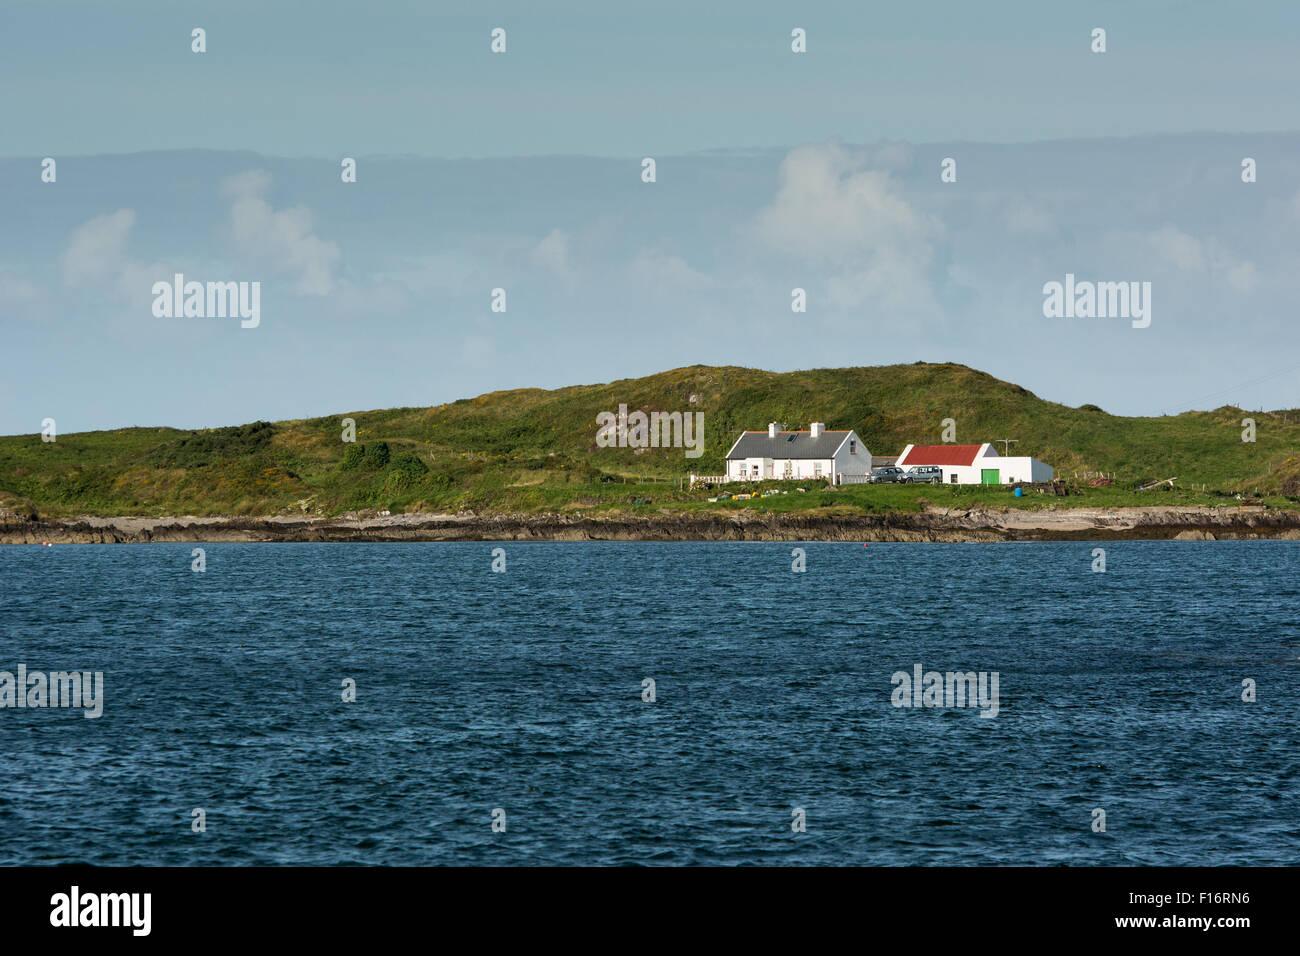 along the Wild Atlantic Way on the West Coast of Ireland - Stock Image